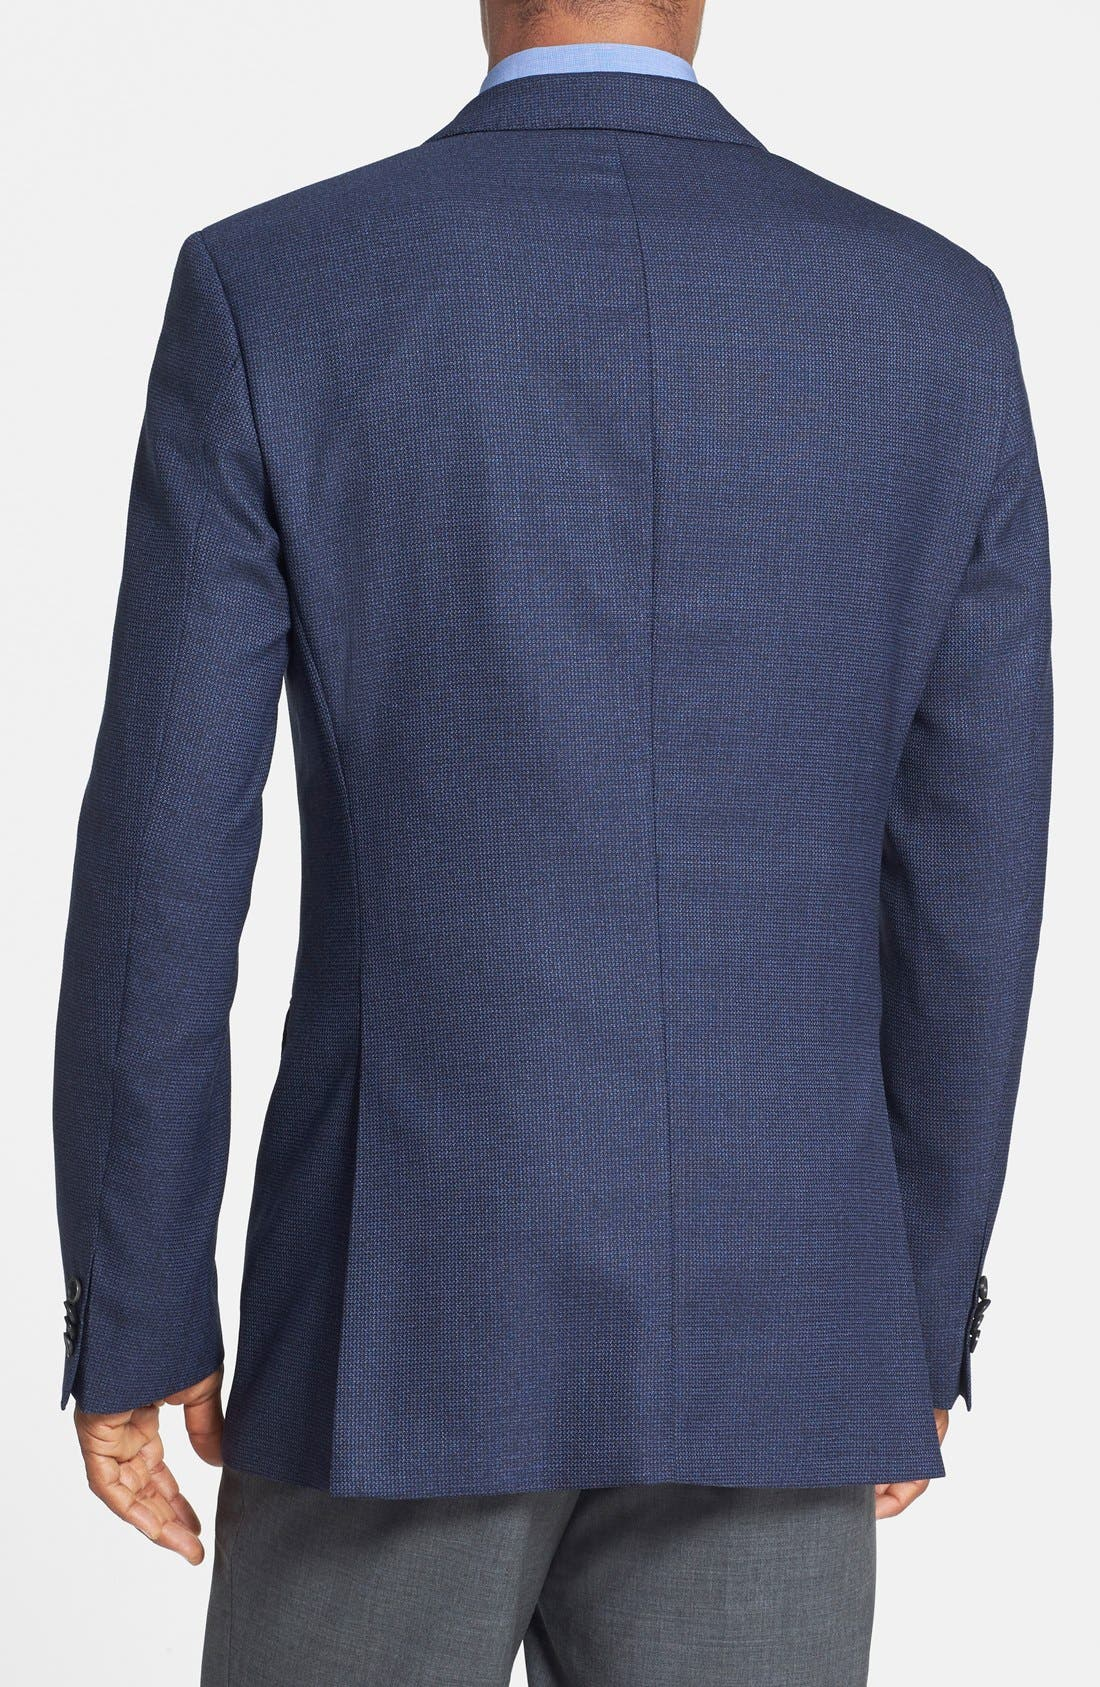 Alternate Image 2  - BOSS HUGO BOSS 'James' Trim Fit Wool Blazer